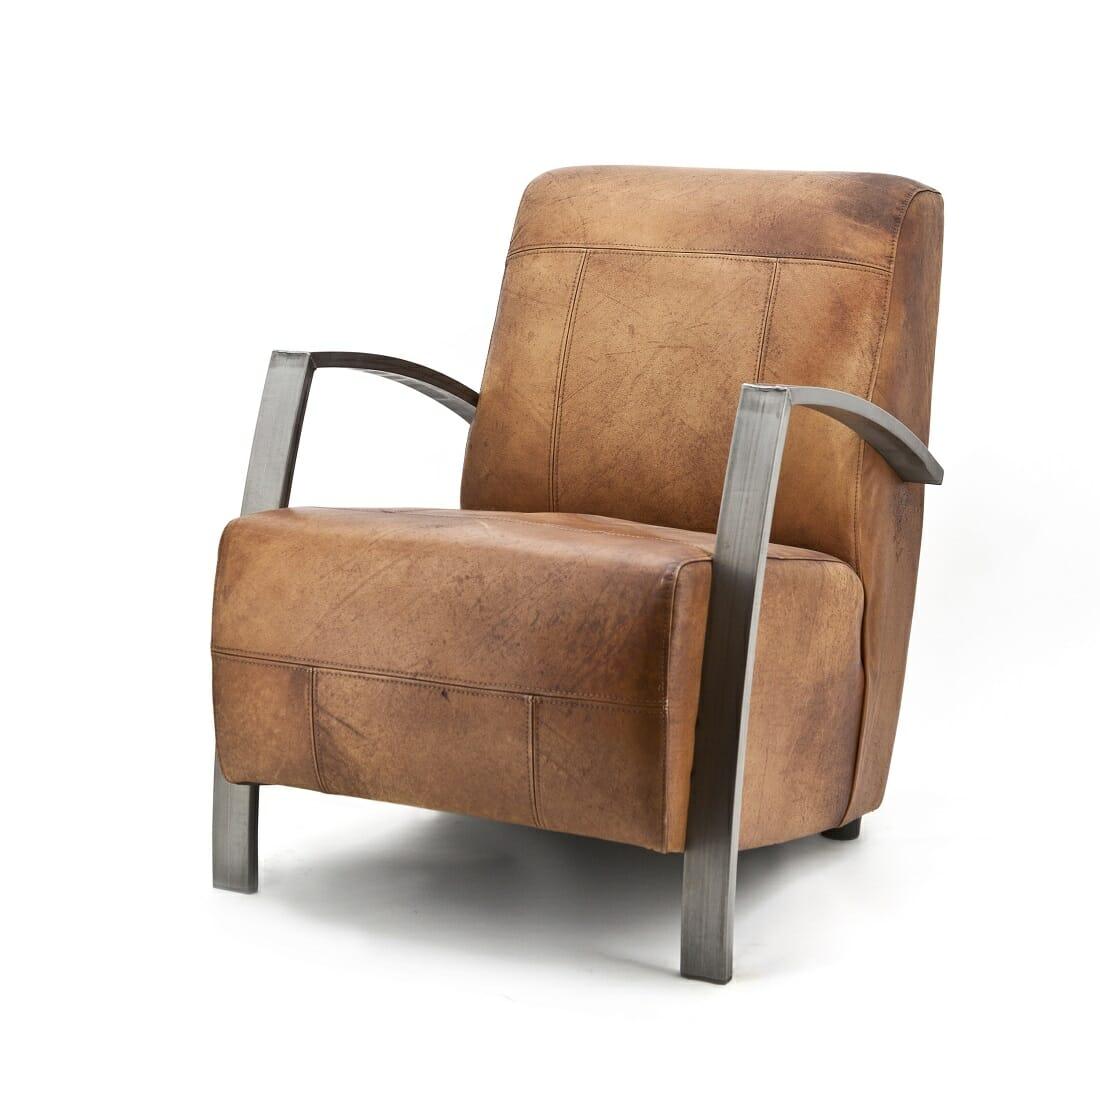 Industri le fauteuil cognac leer for Industrieel fauteuil